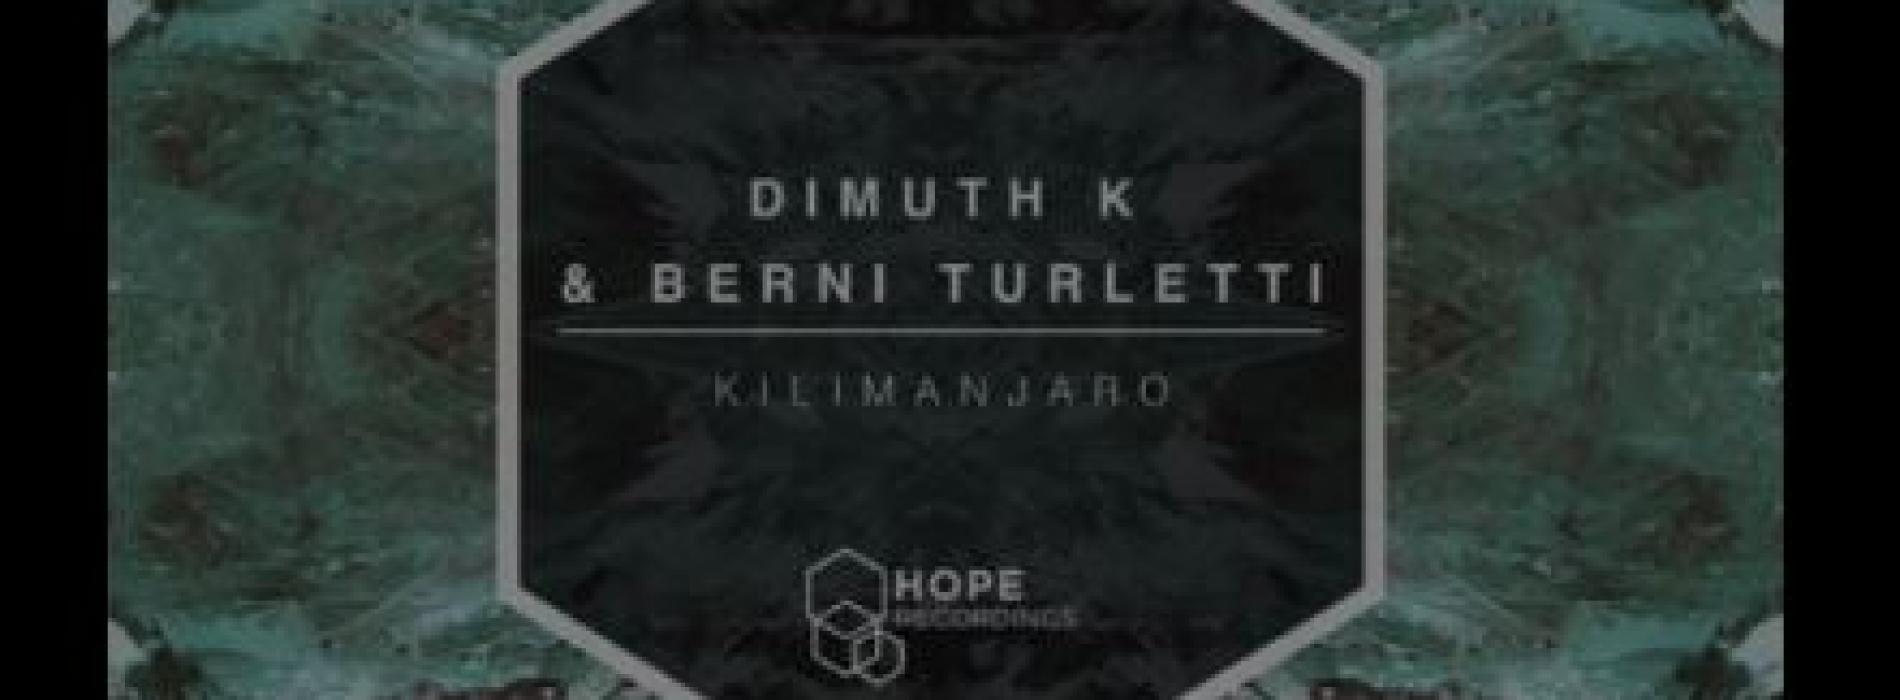 Dimuth K & Berni Turletti – Kilimanjaro EP [Hope Recordings]